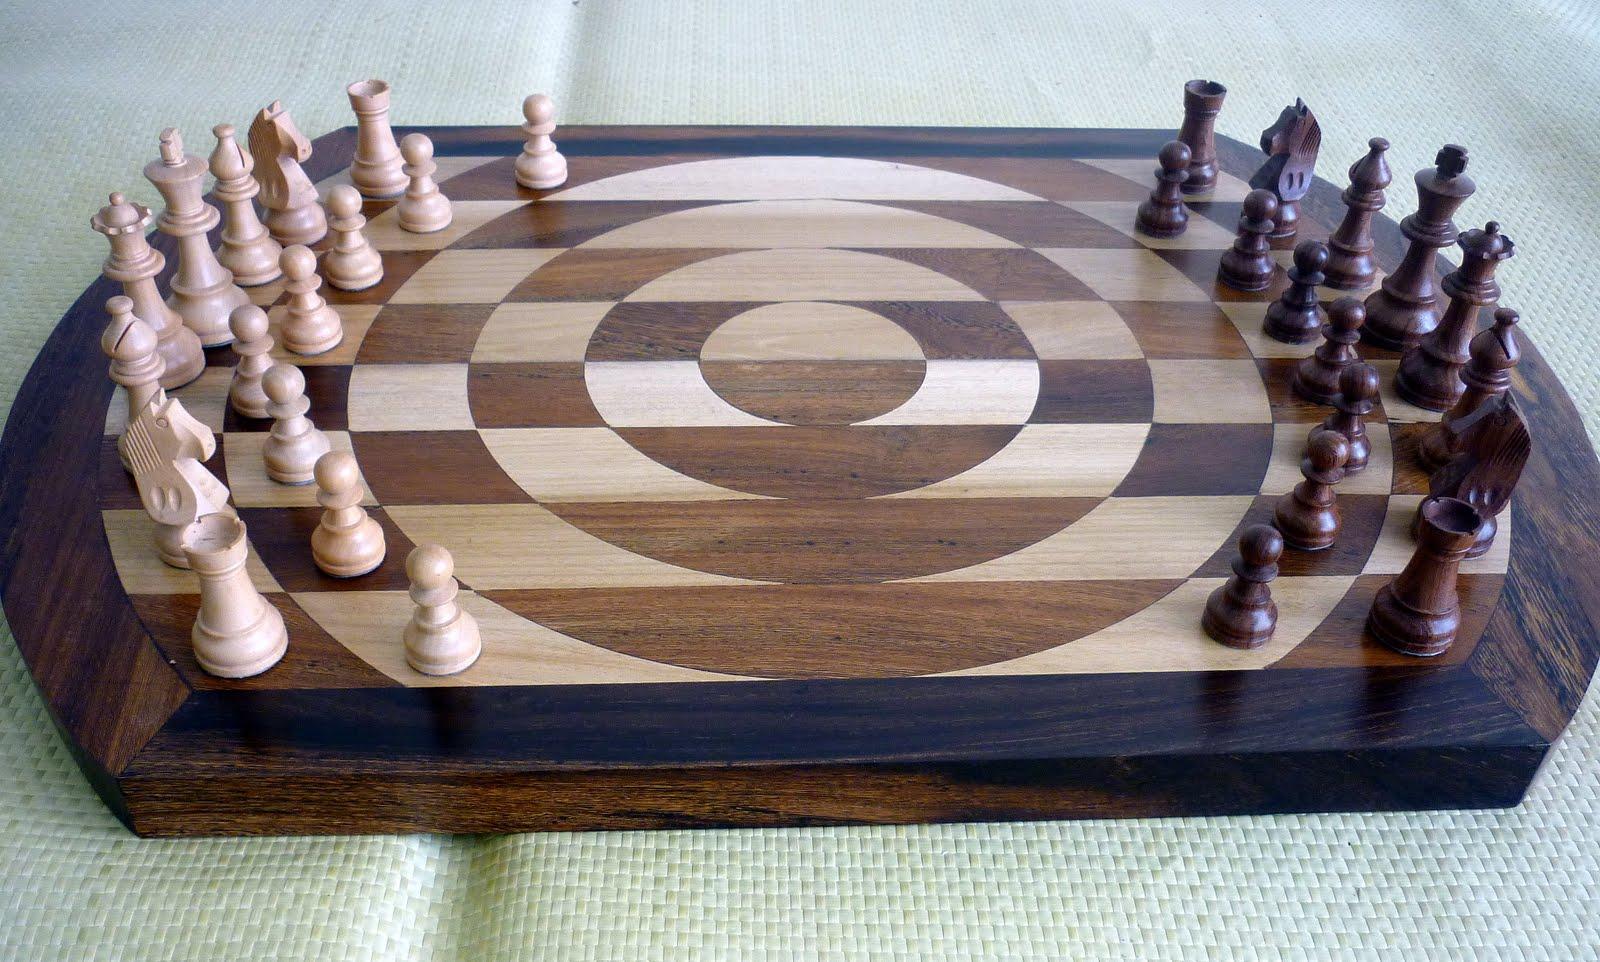 Chess Board Setup Diagram 2 Way Switch Wiring Singularity